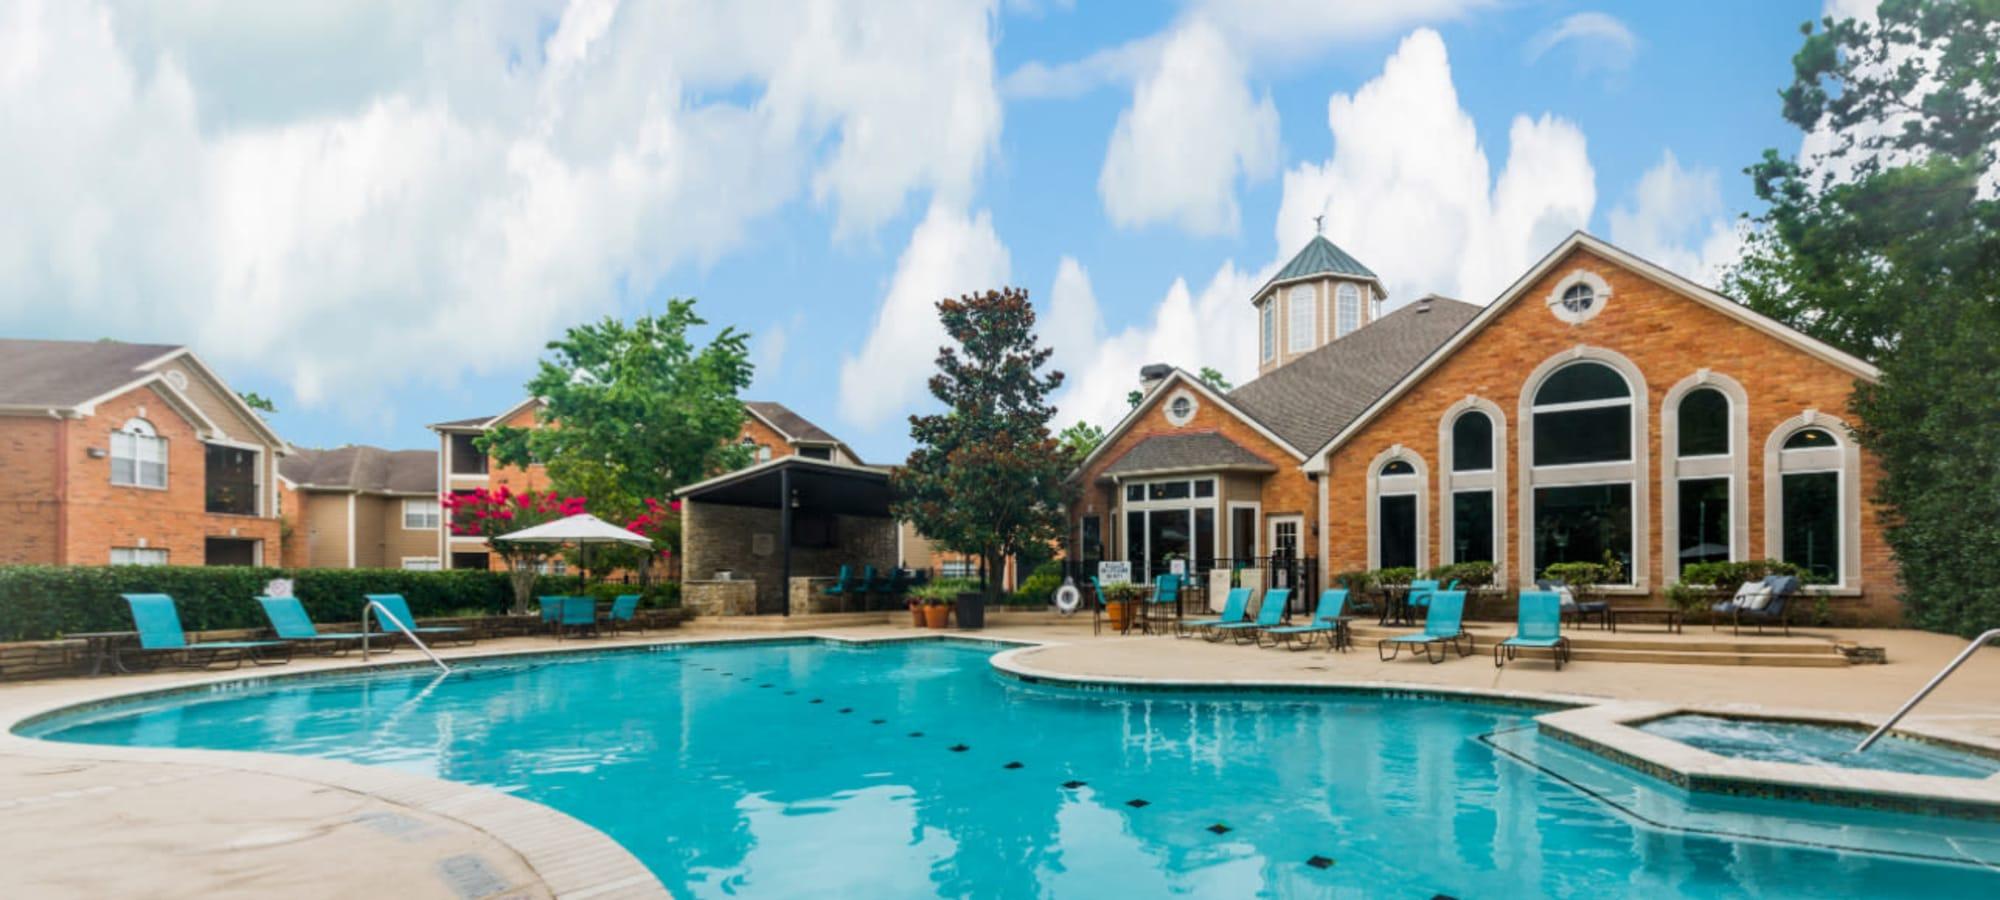 Apartments at Marquis at Kingwood in Kingwood, Texas